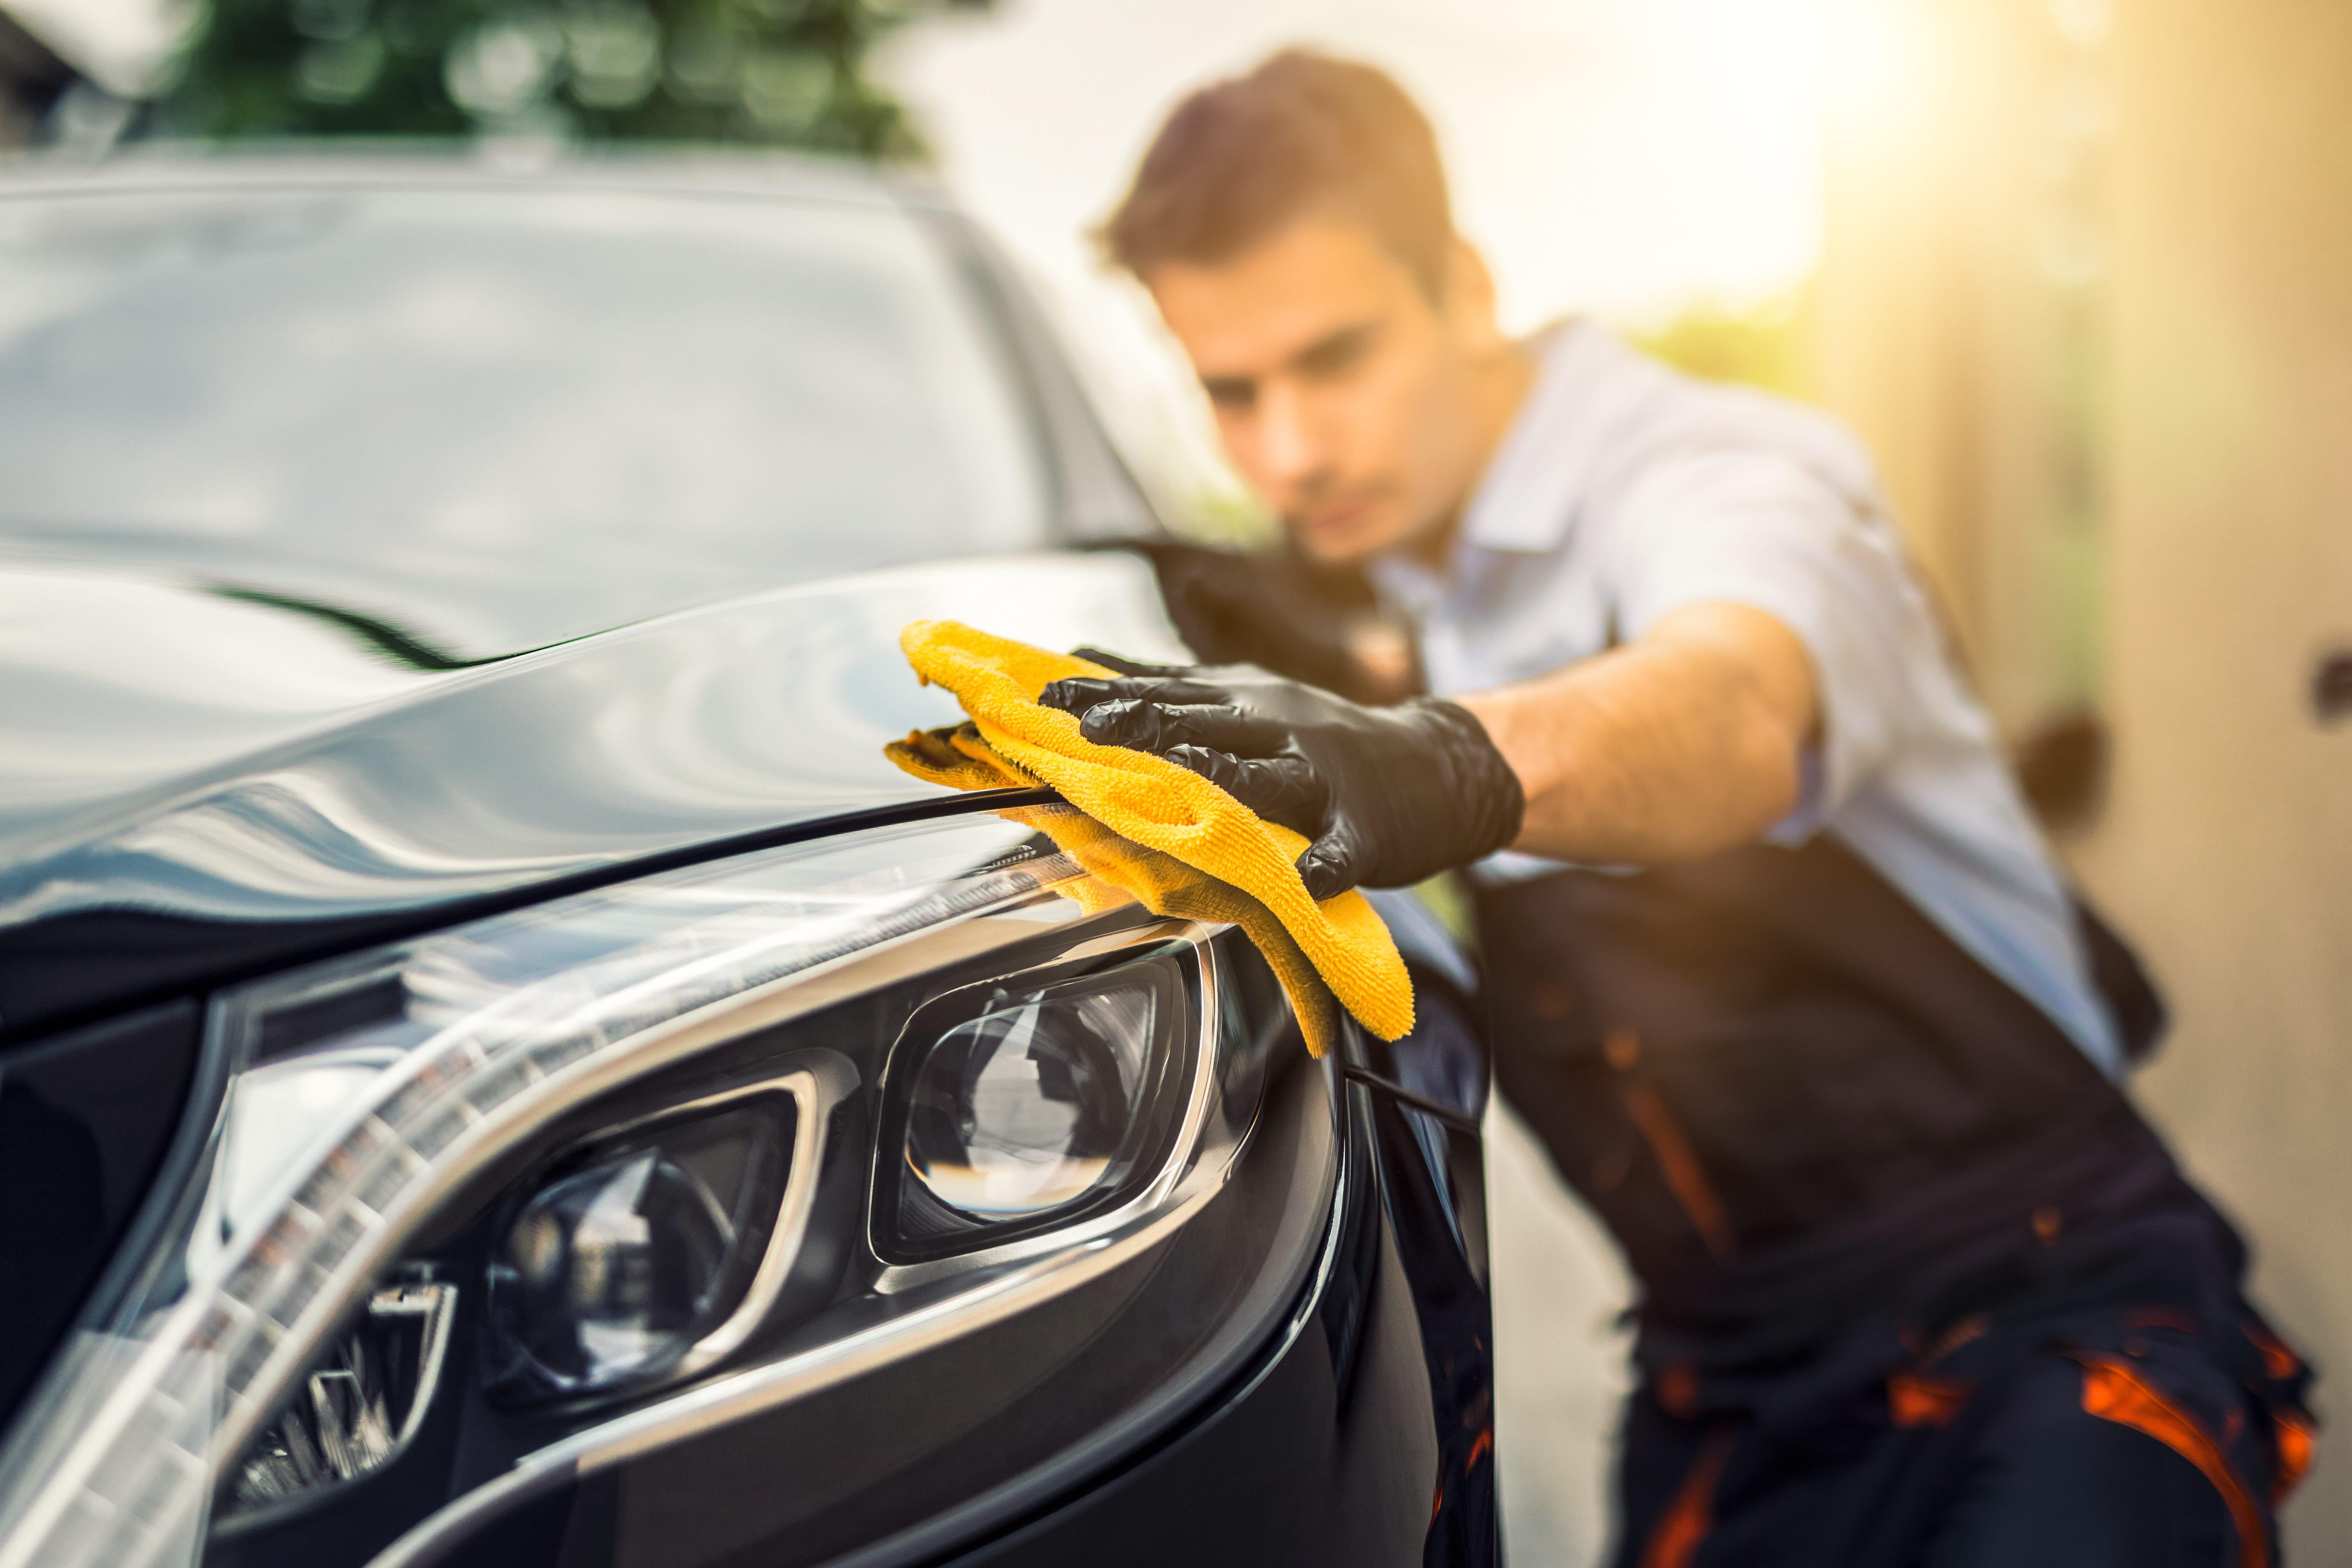 summer-car-washing-cleaning-using-high